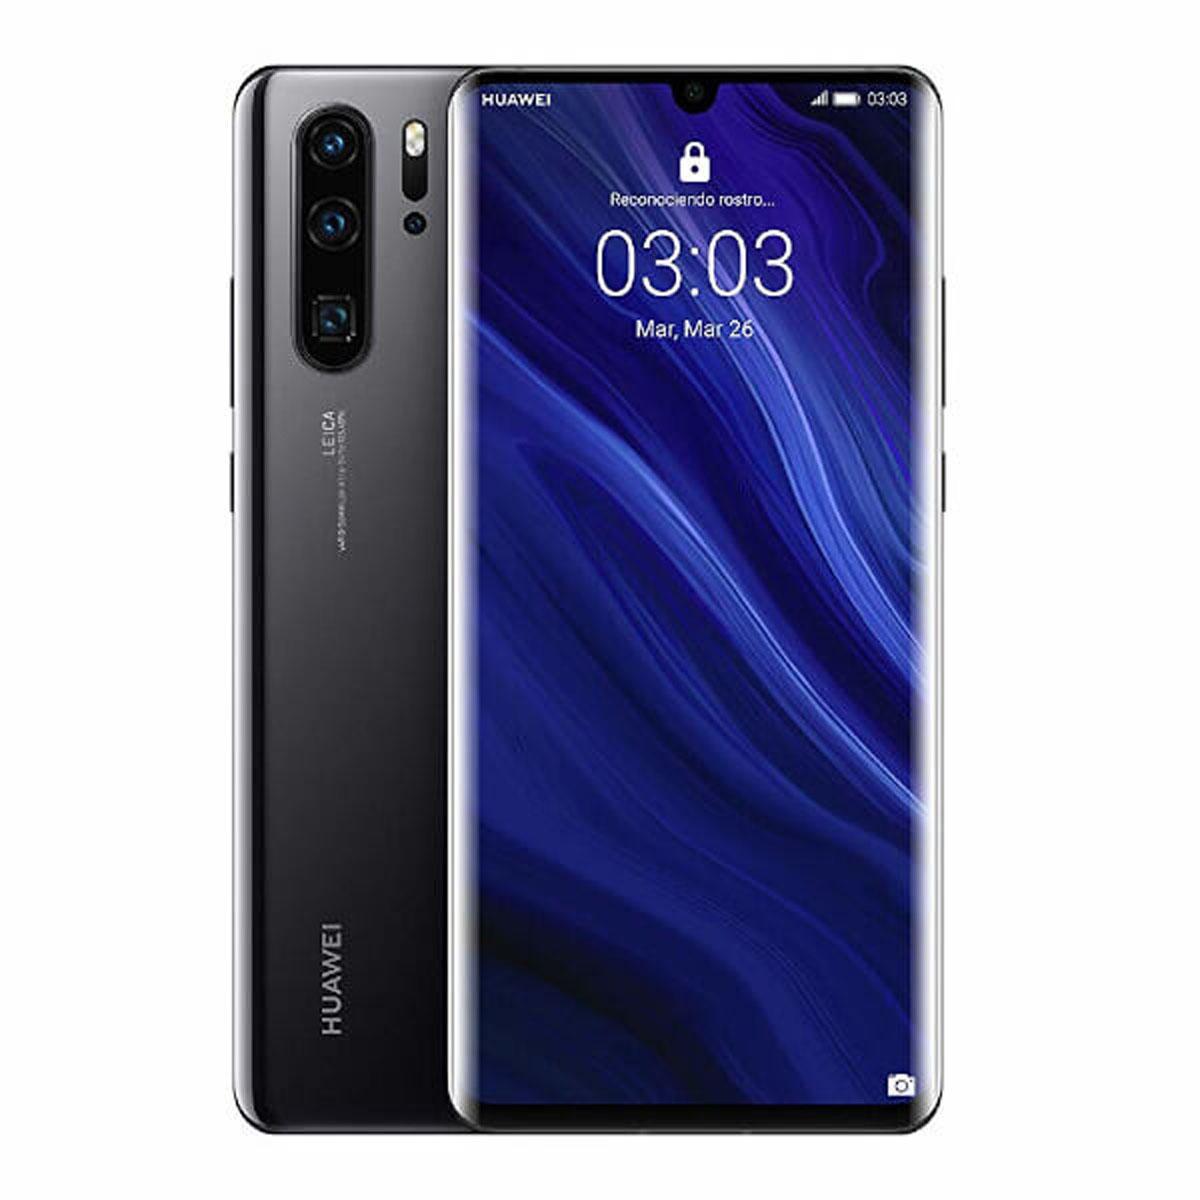 Huawei p30 pro 6gb/128gb negro dual